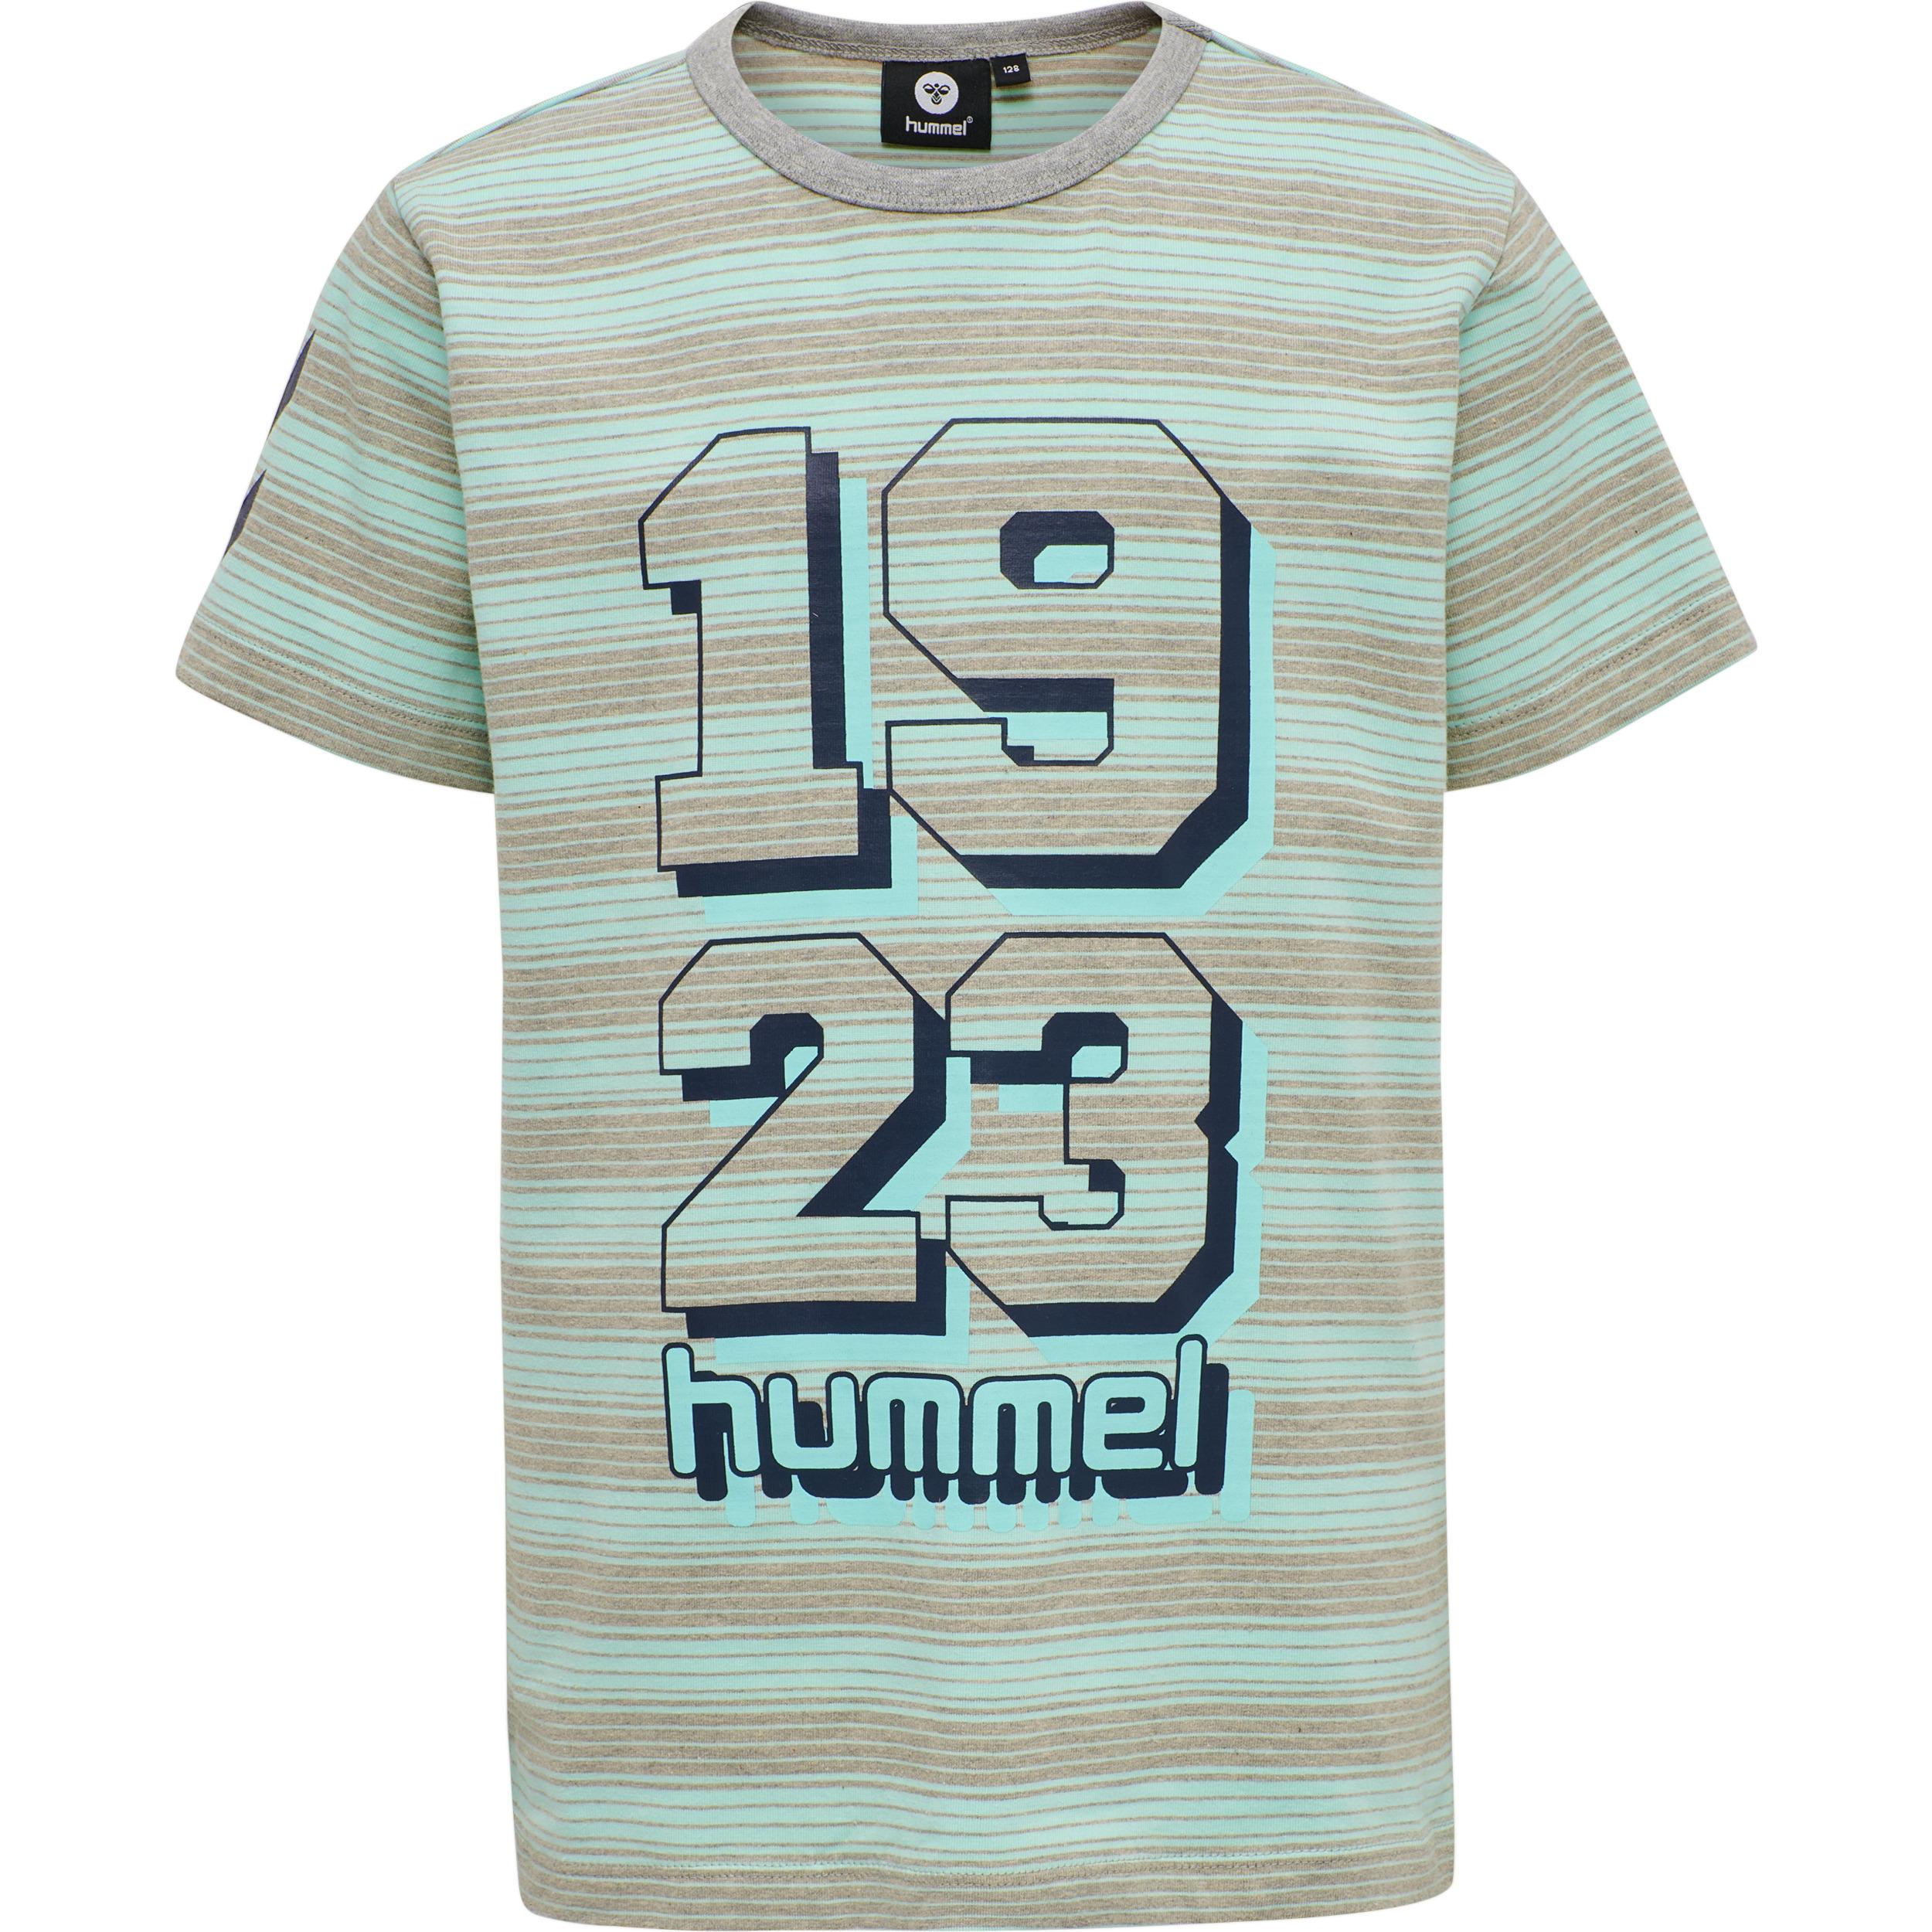 Hummel Mack t-shirt, blue tint, 116